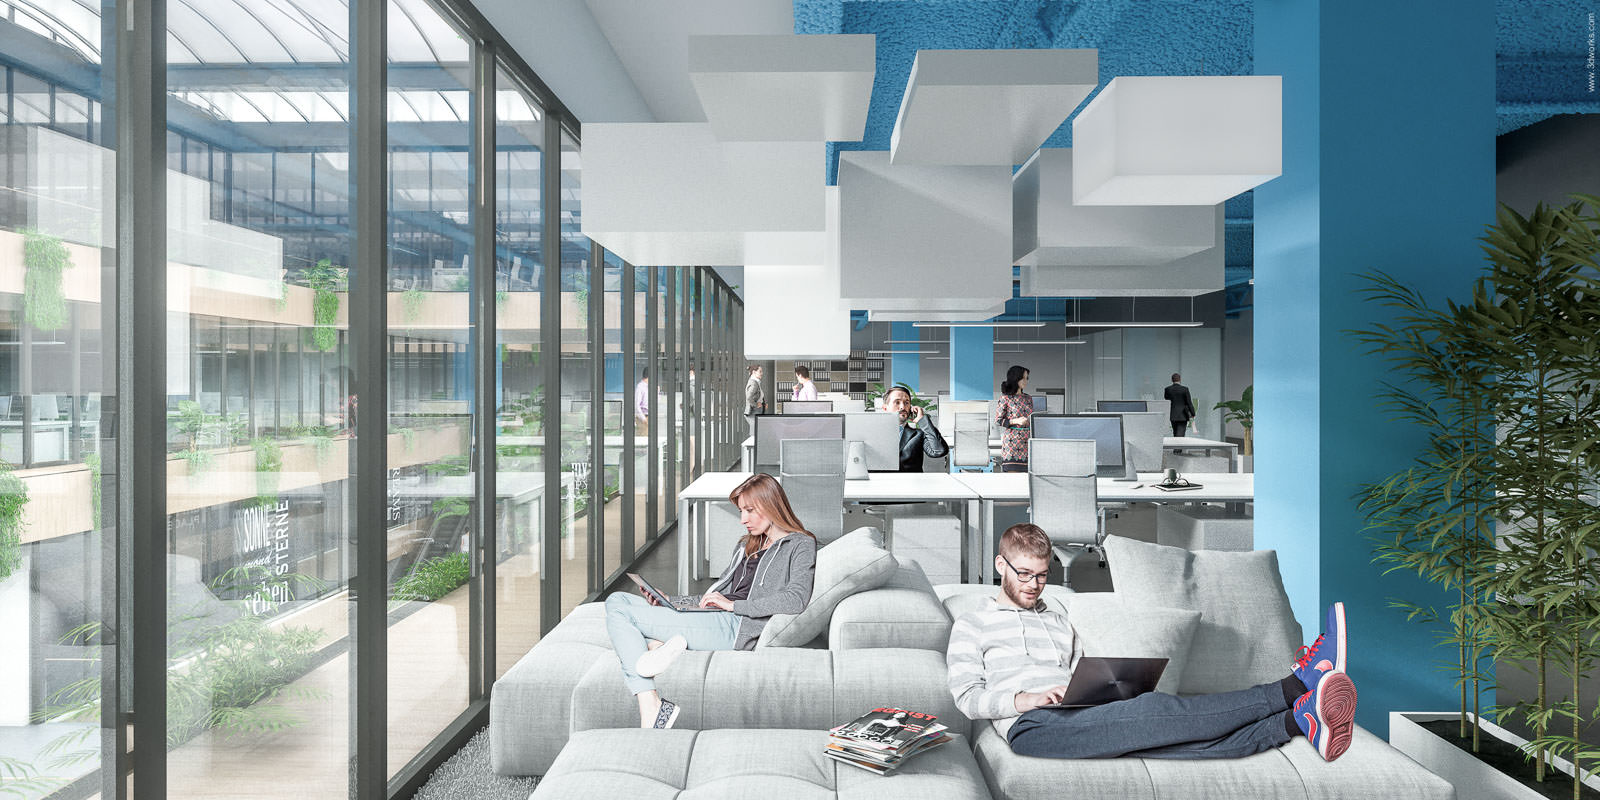 Forum Steglitz / Office Interior - Aukett Heese